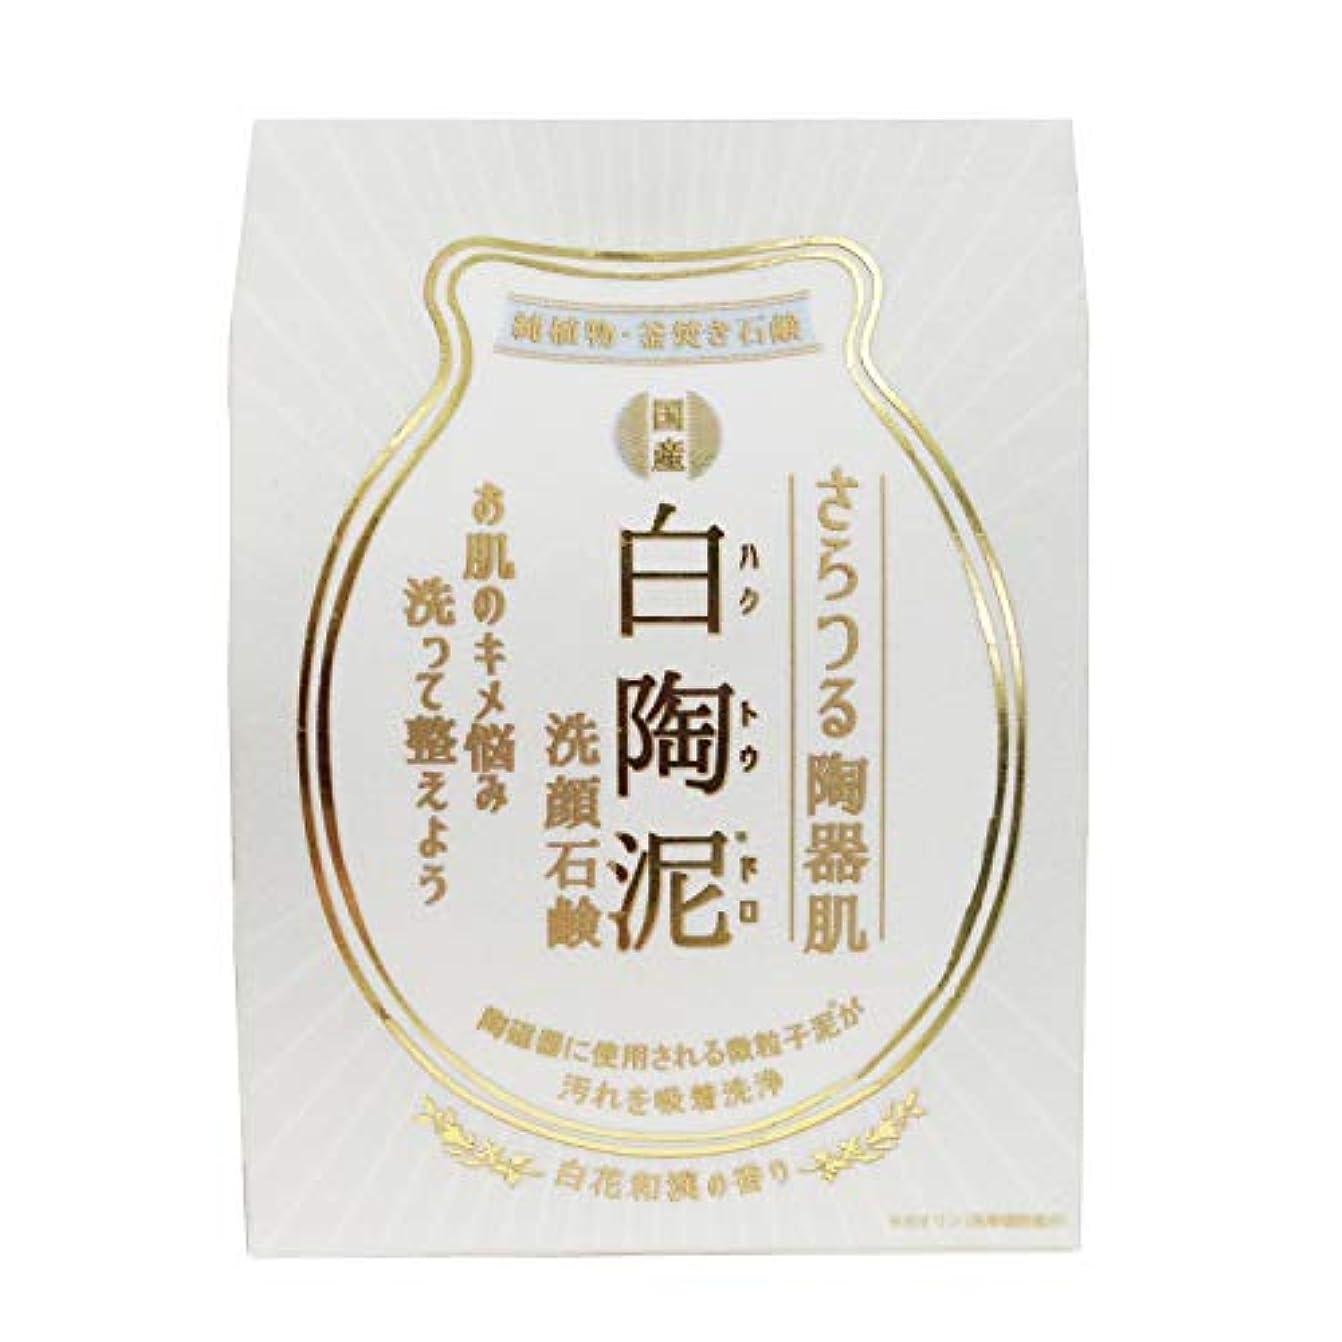 領事館束任意ペリカン石鹸 白陶泥洗顔石鹸 100g